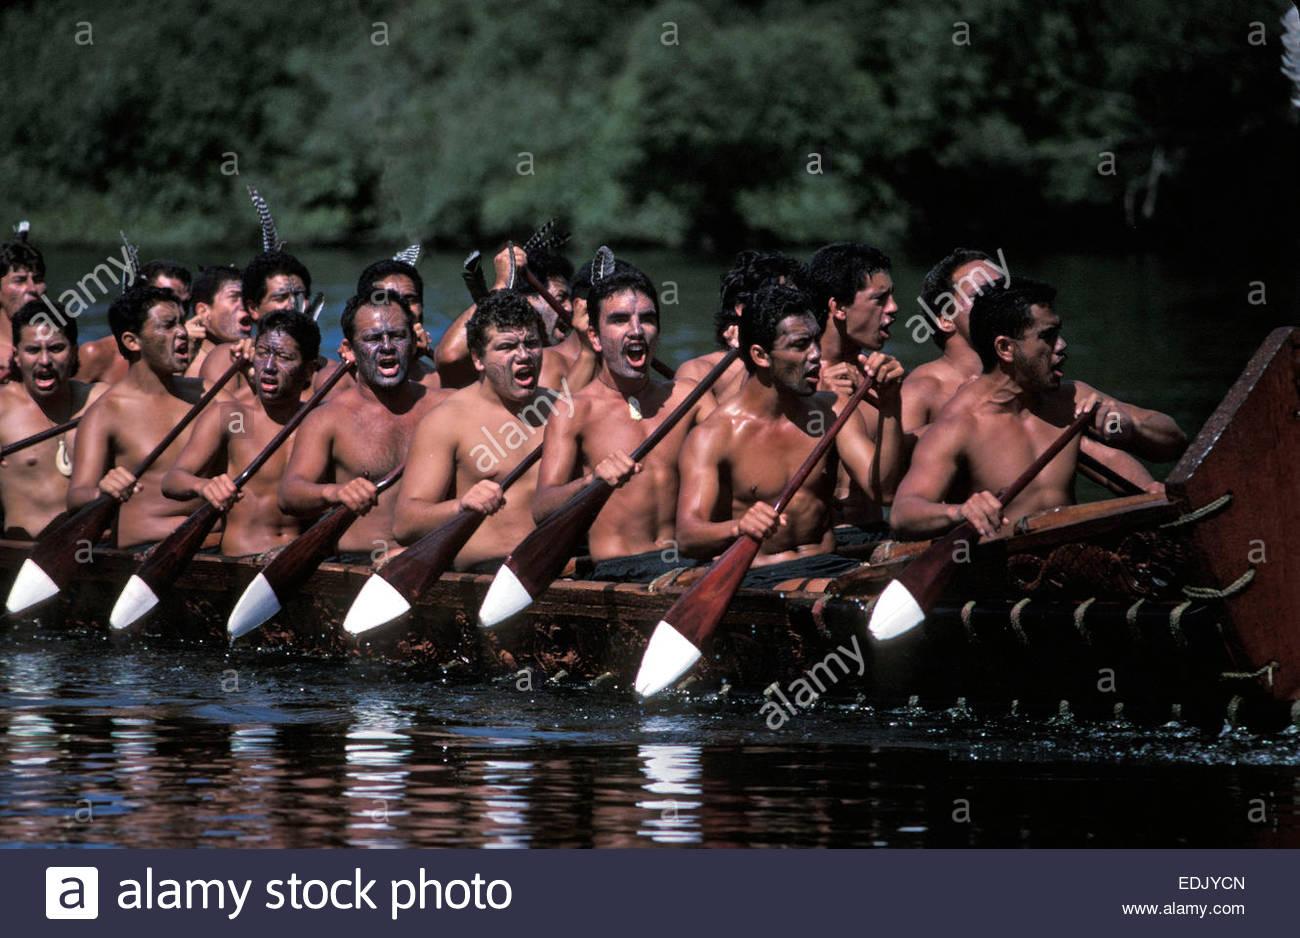 Ngaruawahia river regatta, Ngaruawahia, North Island, New Zealand. - Stock Image